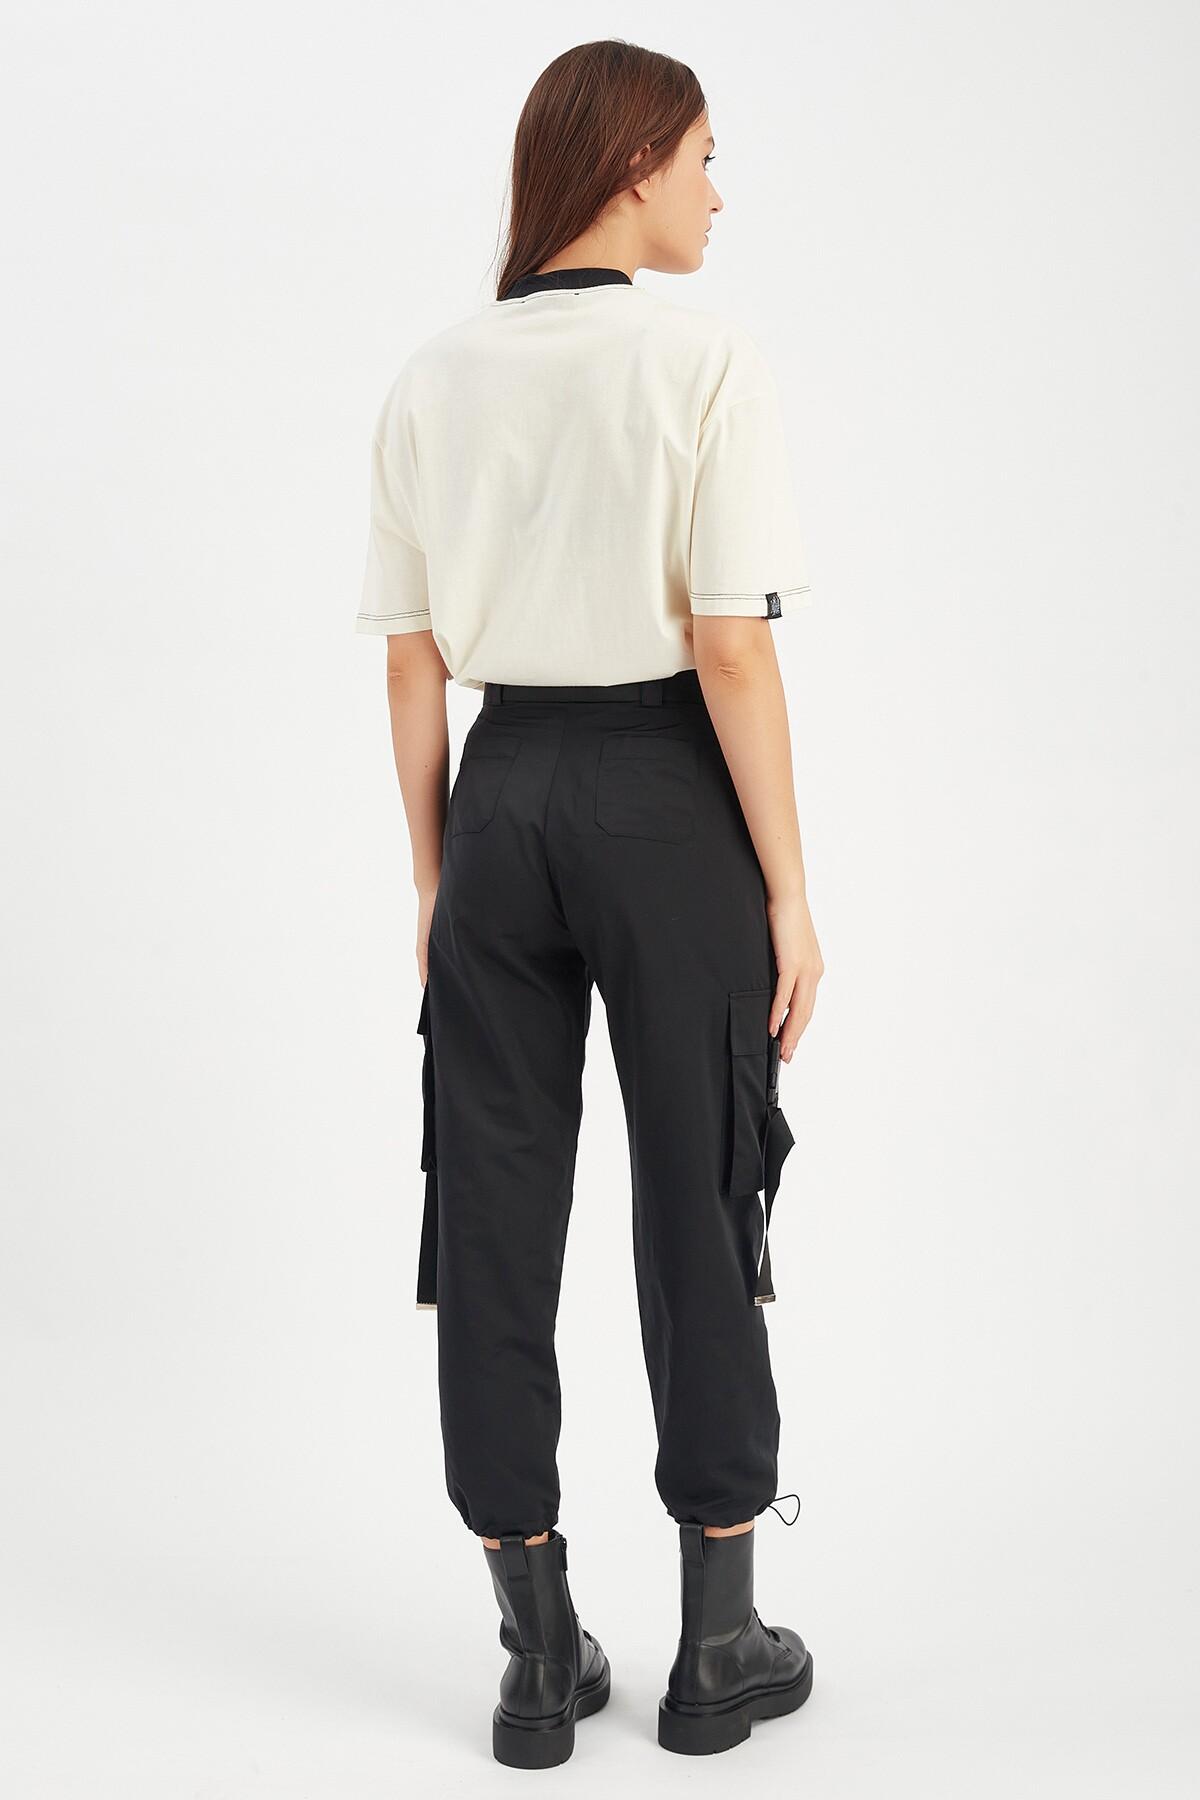 Siyah Jogging Kadın Pantolon | Mk21W660099